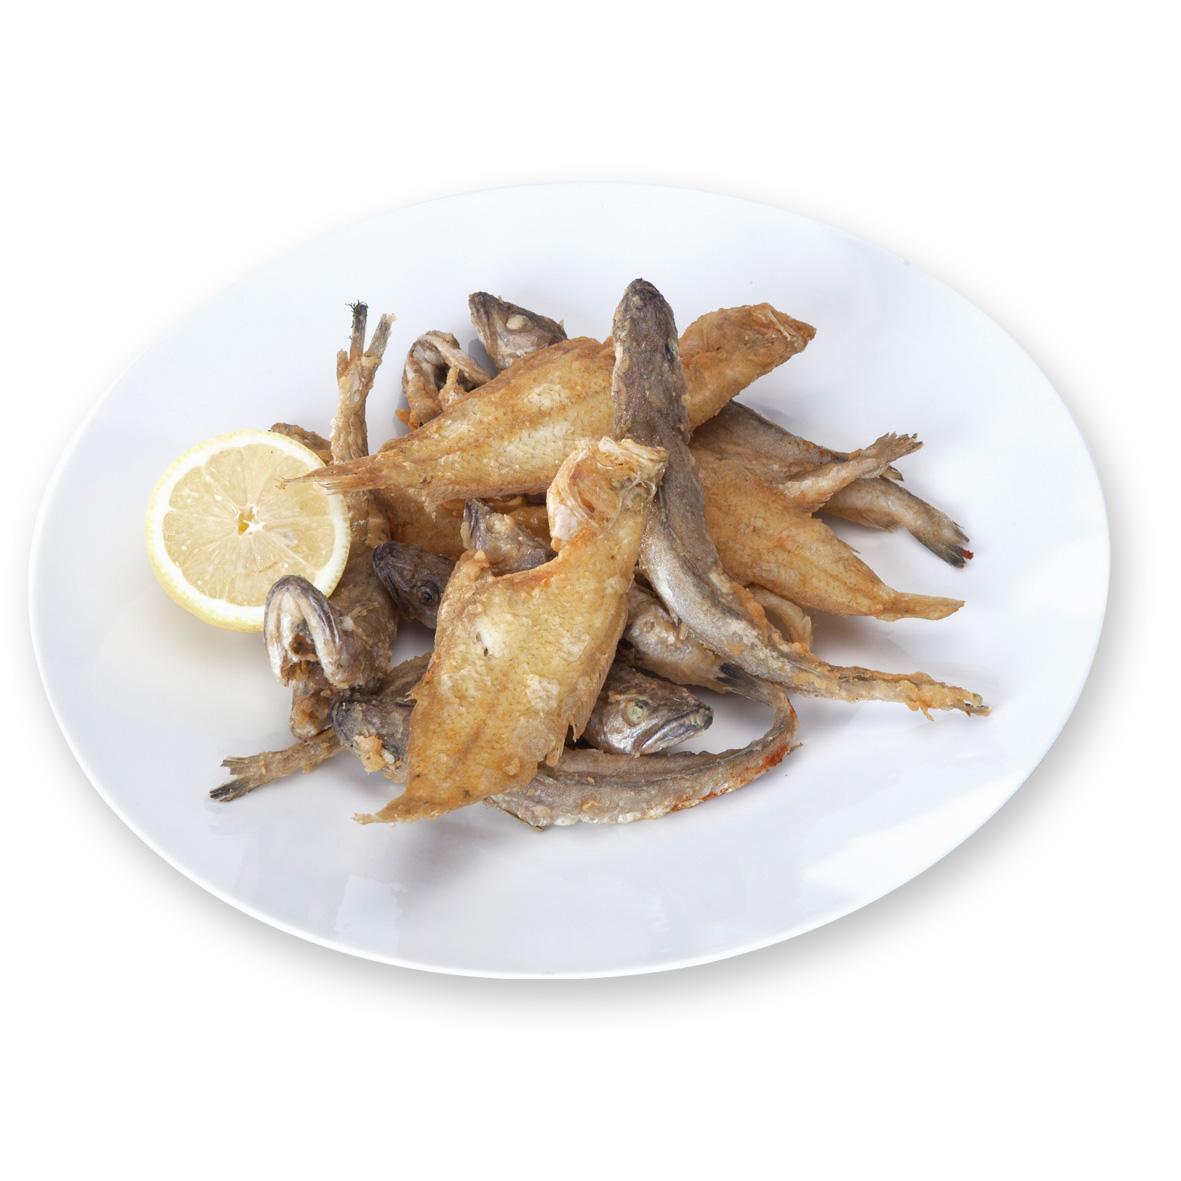 Restaurante Alicante Juan Abril - Platos - Fritura de pescado